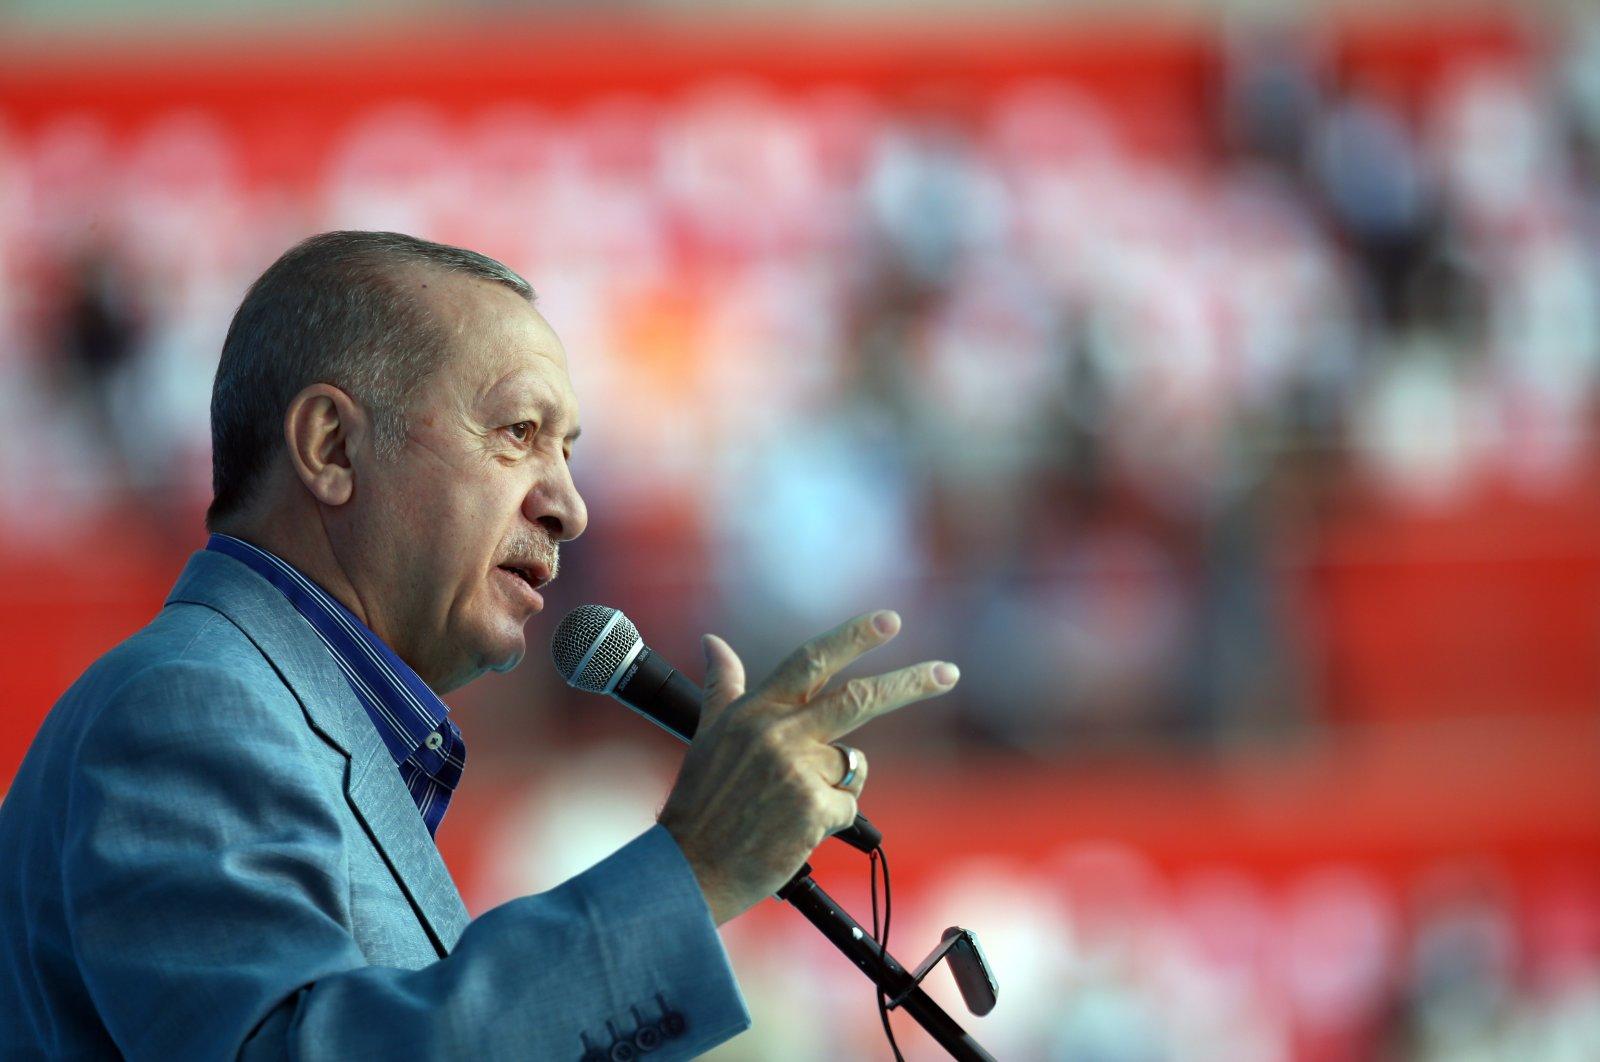 President Recep Tayyip Erdoğan speaks at an AK Party rally in Kayseri province on Oct. 24, 2020 (AA Photo)